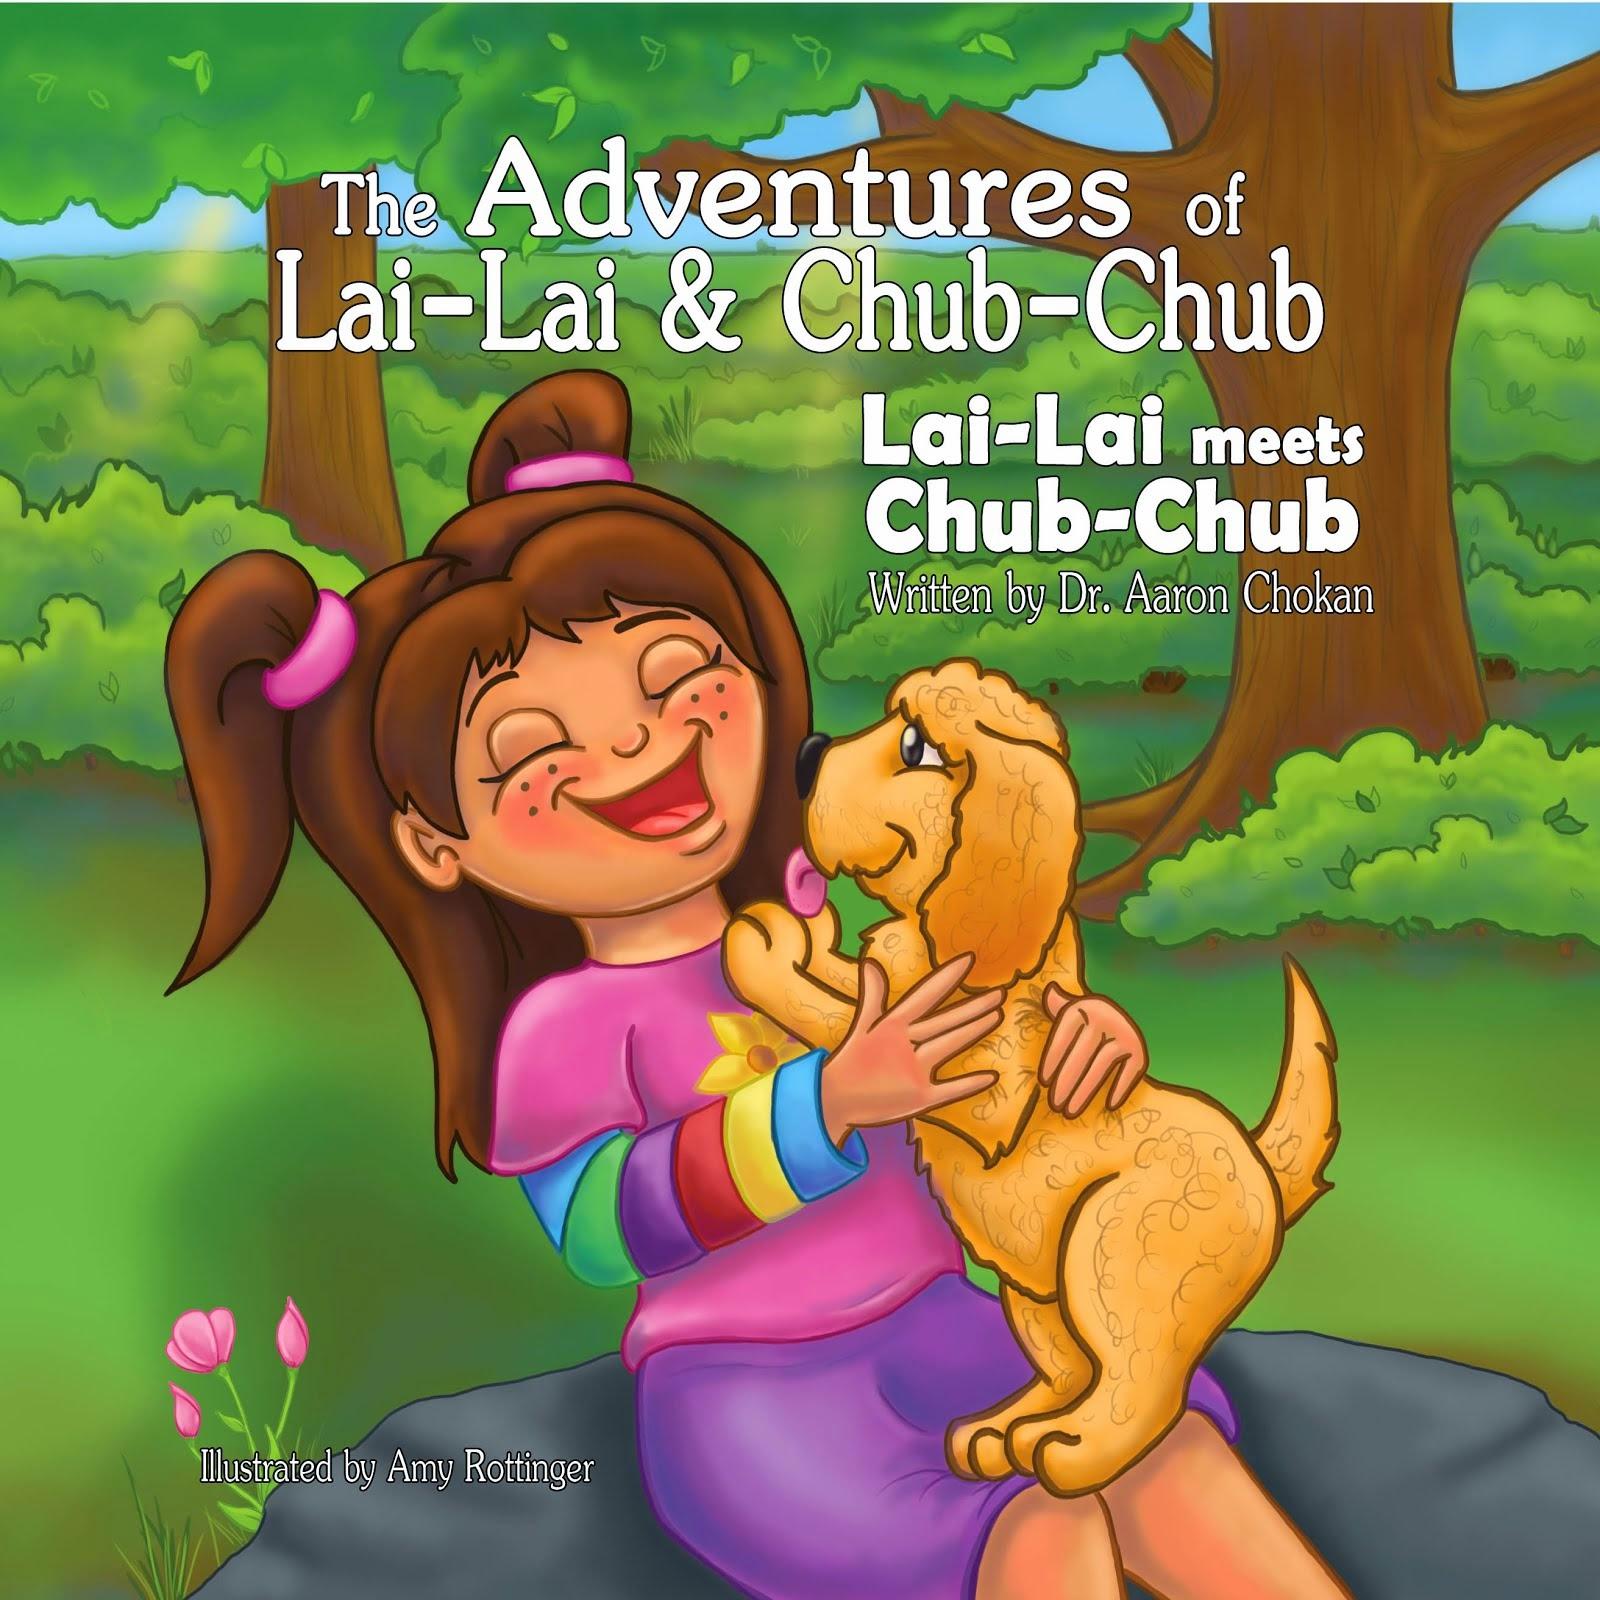 The Adventures of Lai-Lai and Chub-Chub